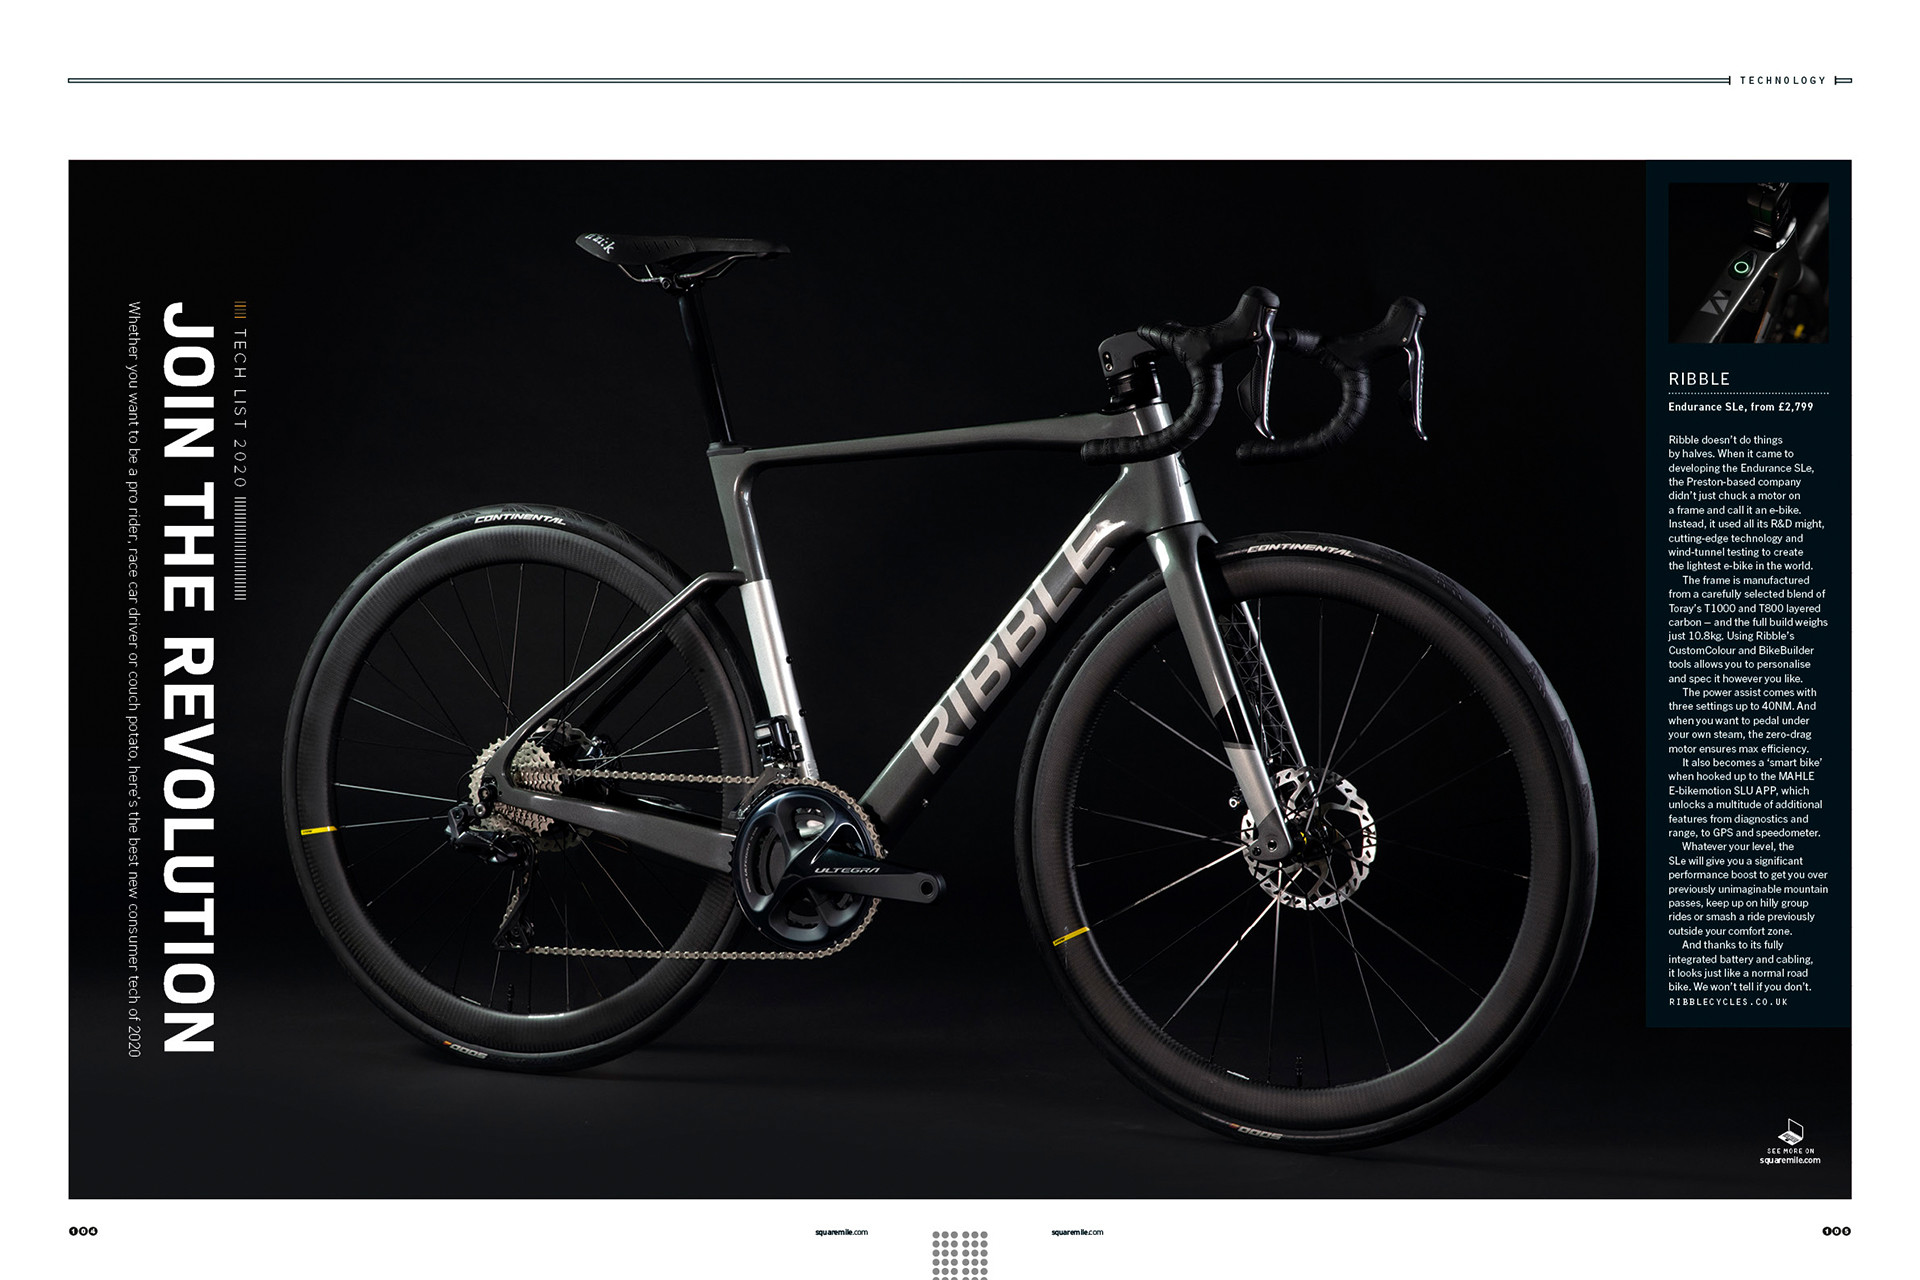 Ribble e bike for Square Mile magazine